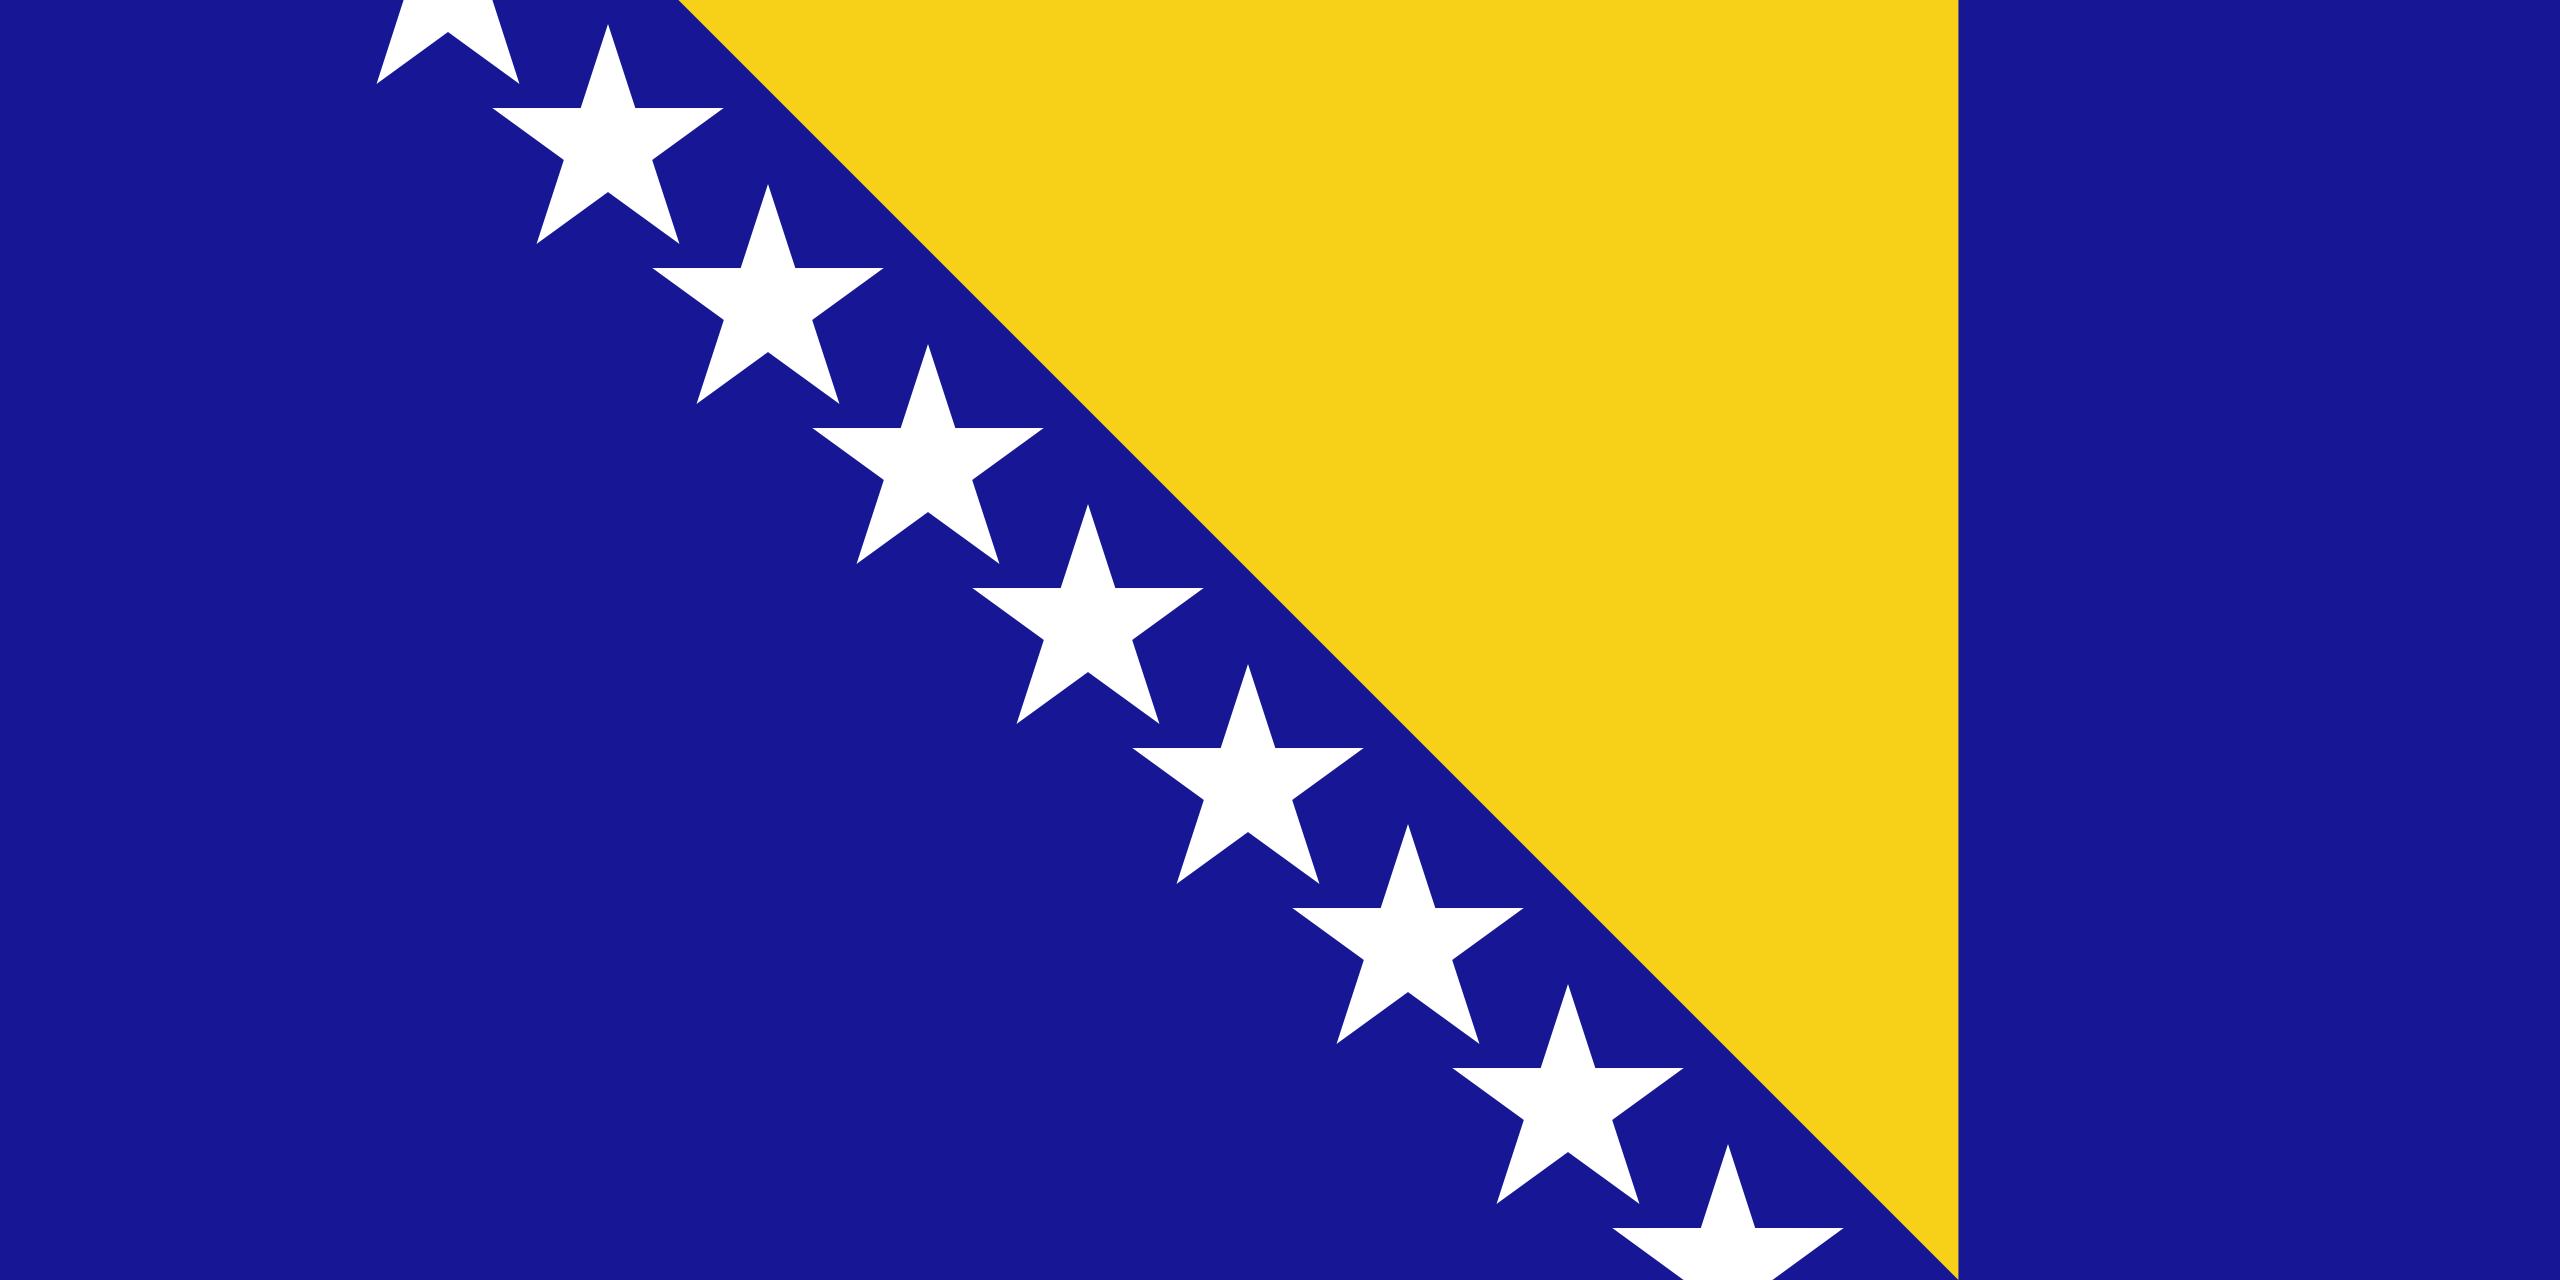 bosnia y herzegovina, 国家, 会徽, 徽标, 符号 - 高清壁纸 - 教授-falken.com